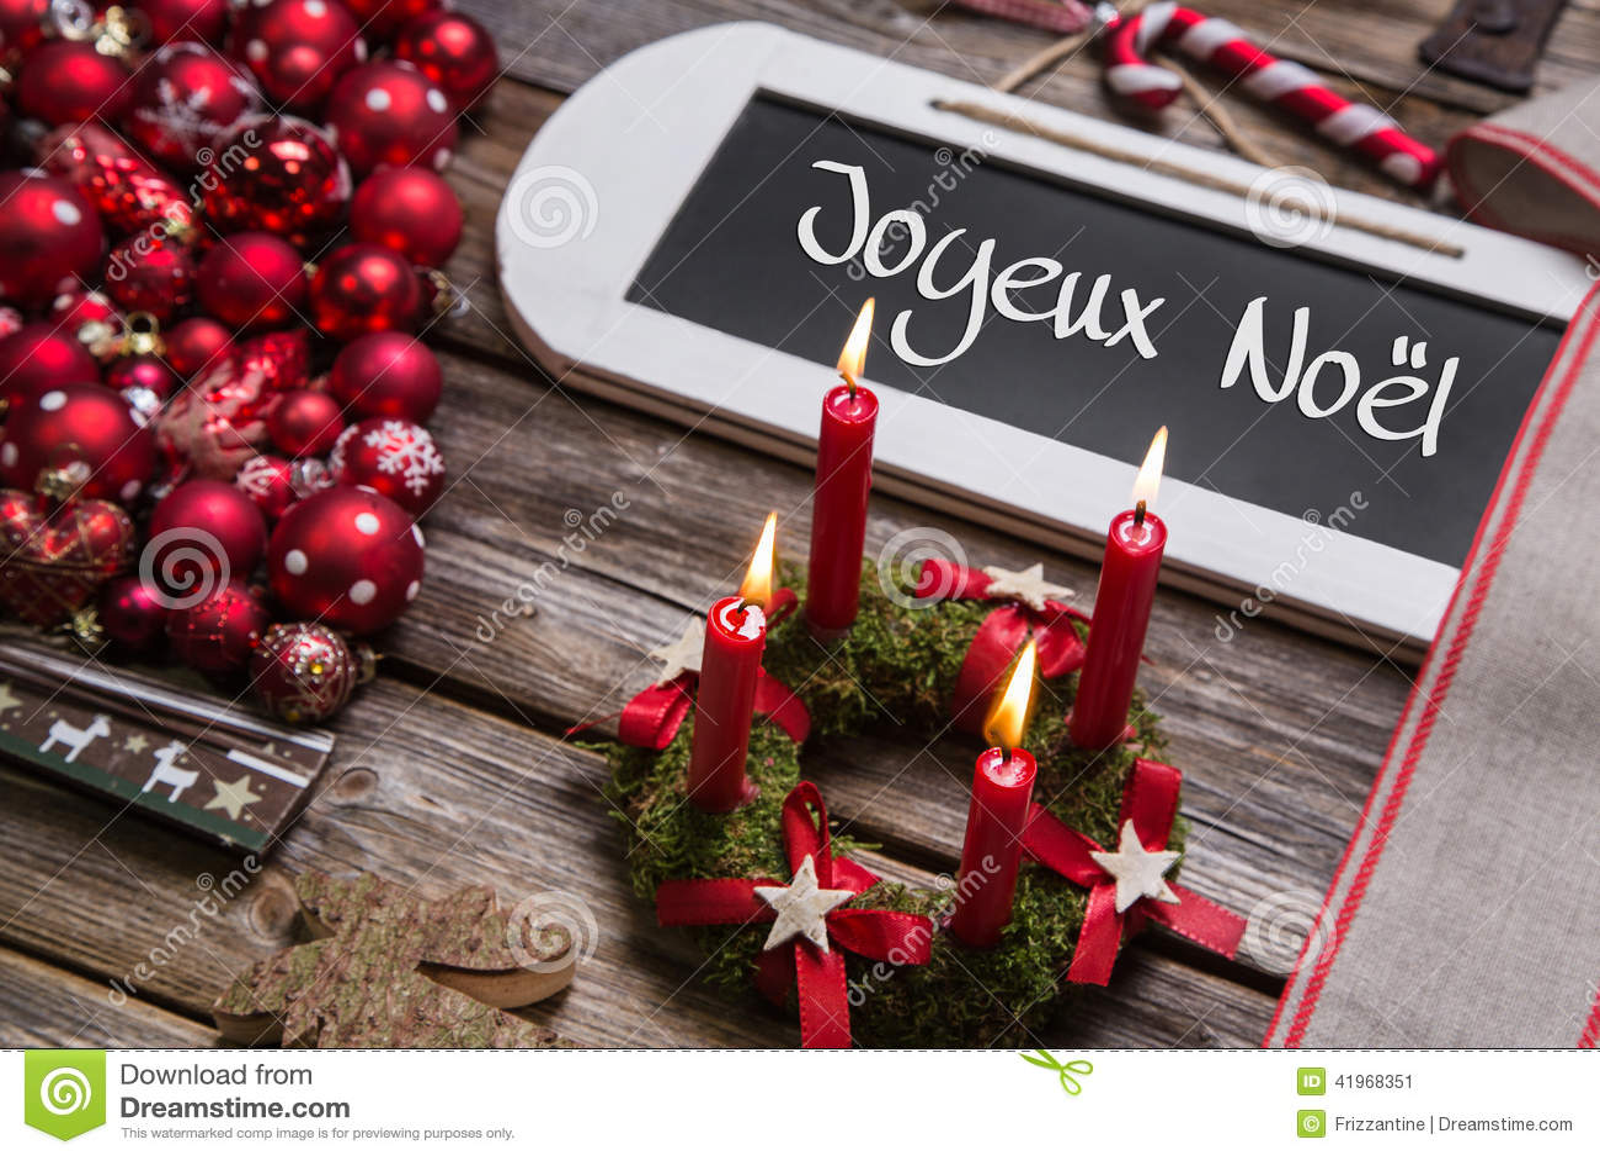 Auguri Di Buon Natale Francese.Immagini Di Natale In Francese Frismarketingadvies